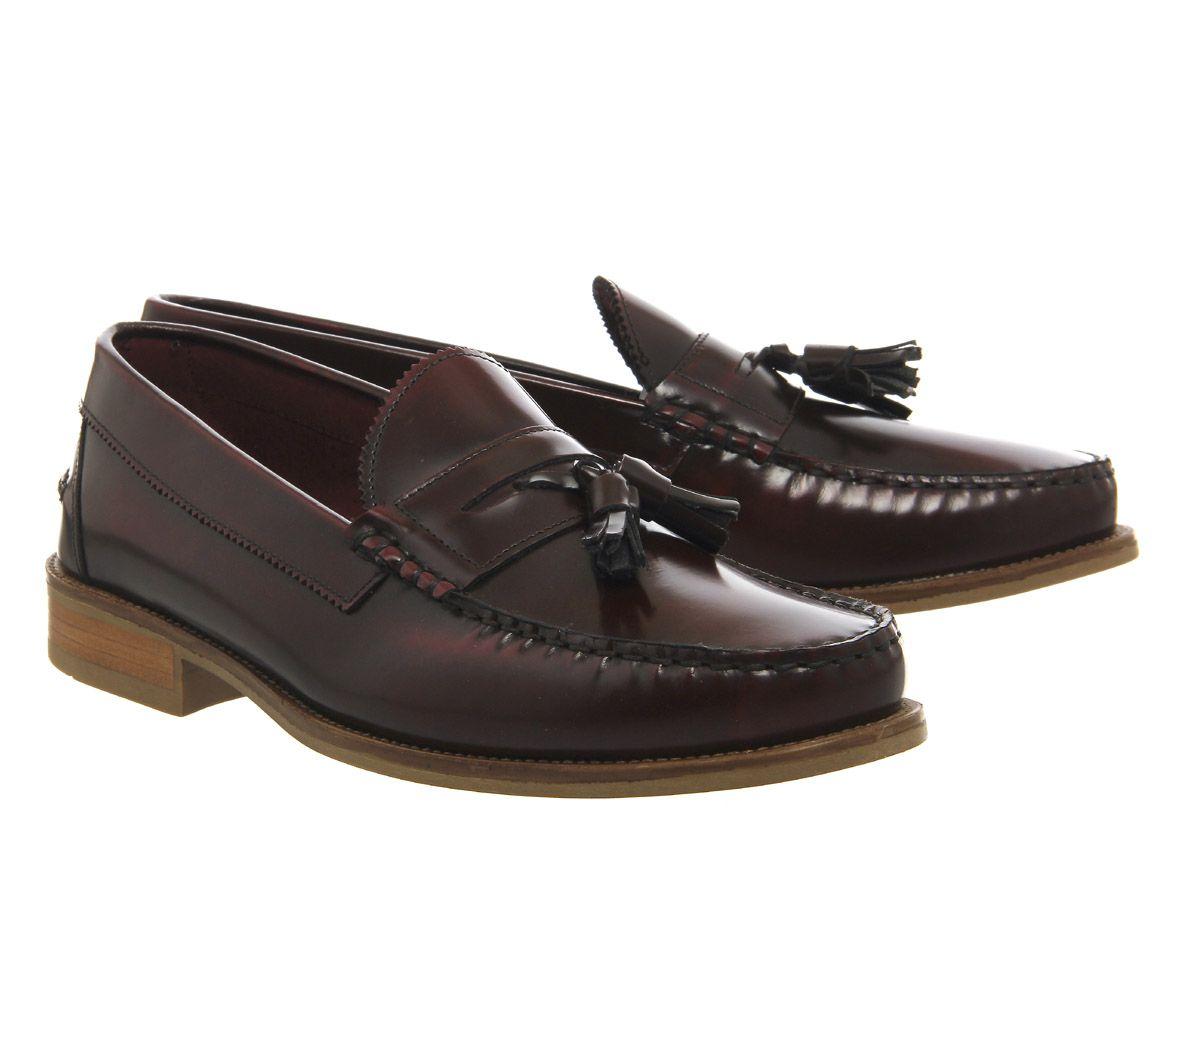 Alto Missus Hombre Borlas Ask Detalles The Bonjourno Burdeos Zapatos De Brillo Mocasines Con tQChdxsr